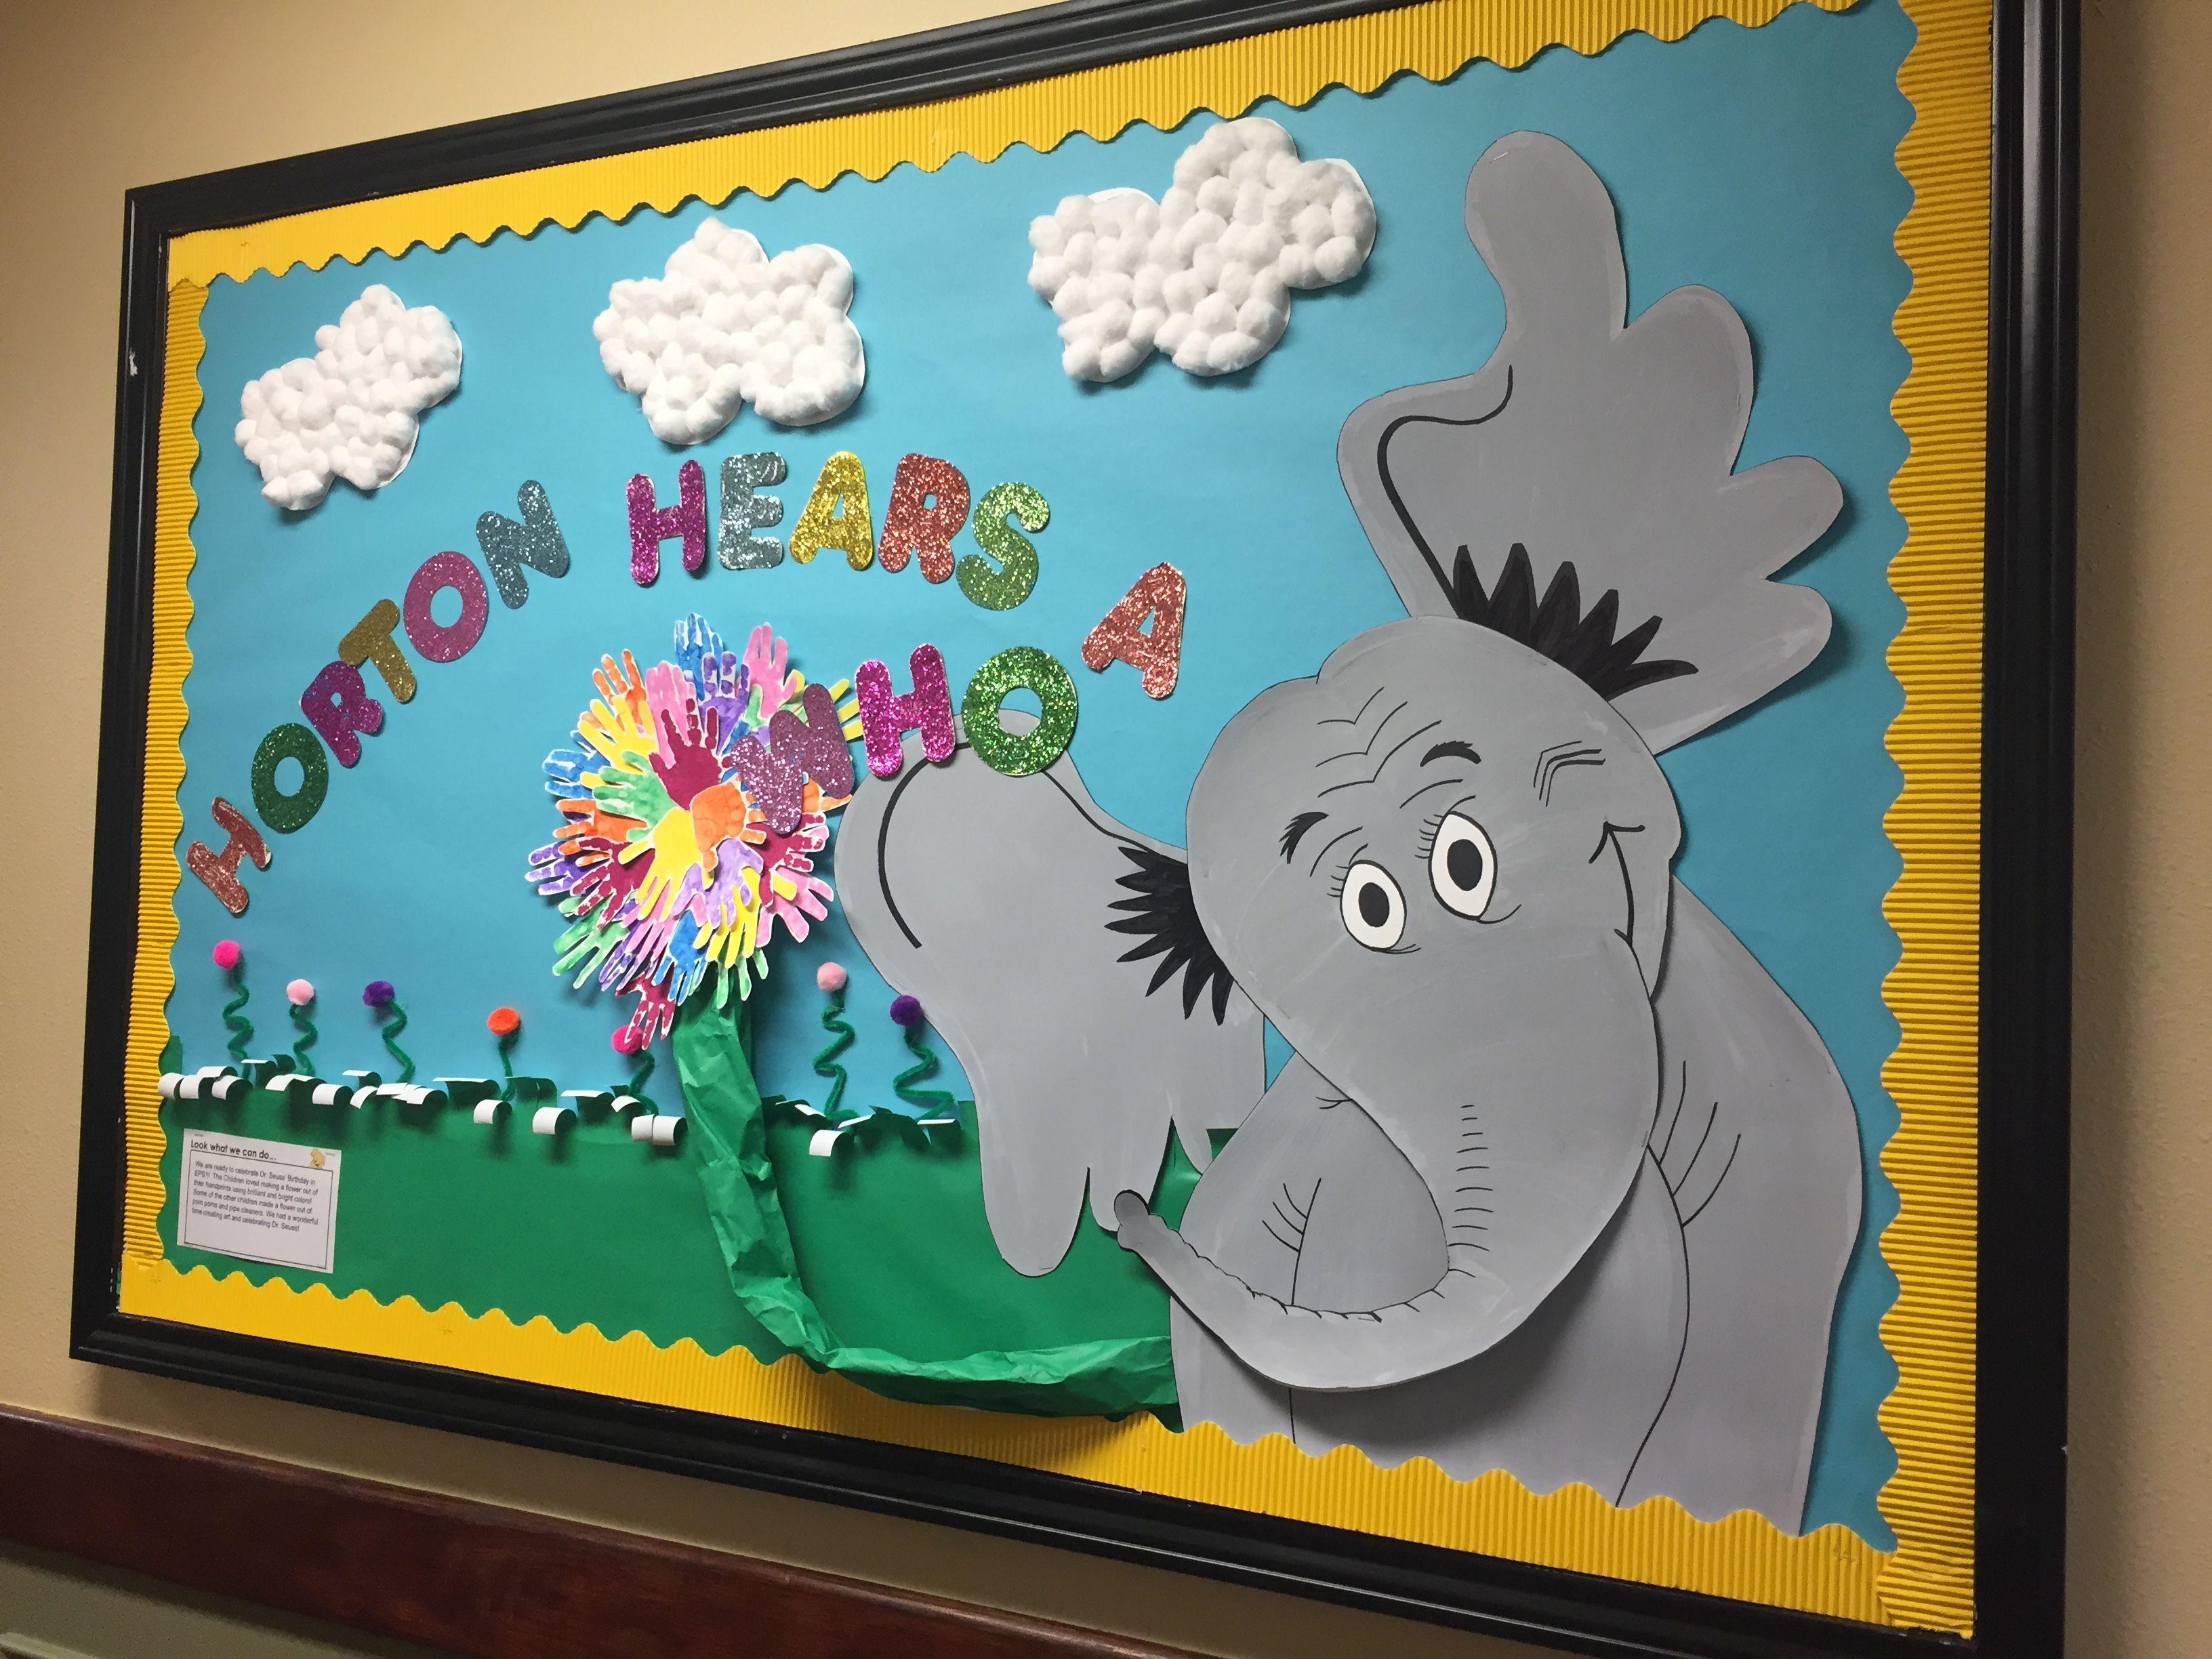 Dr Seuss Horton Hears A Who Bulletin Board Pta Themes Classroom I Love School